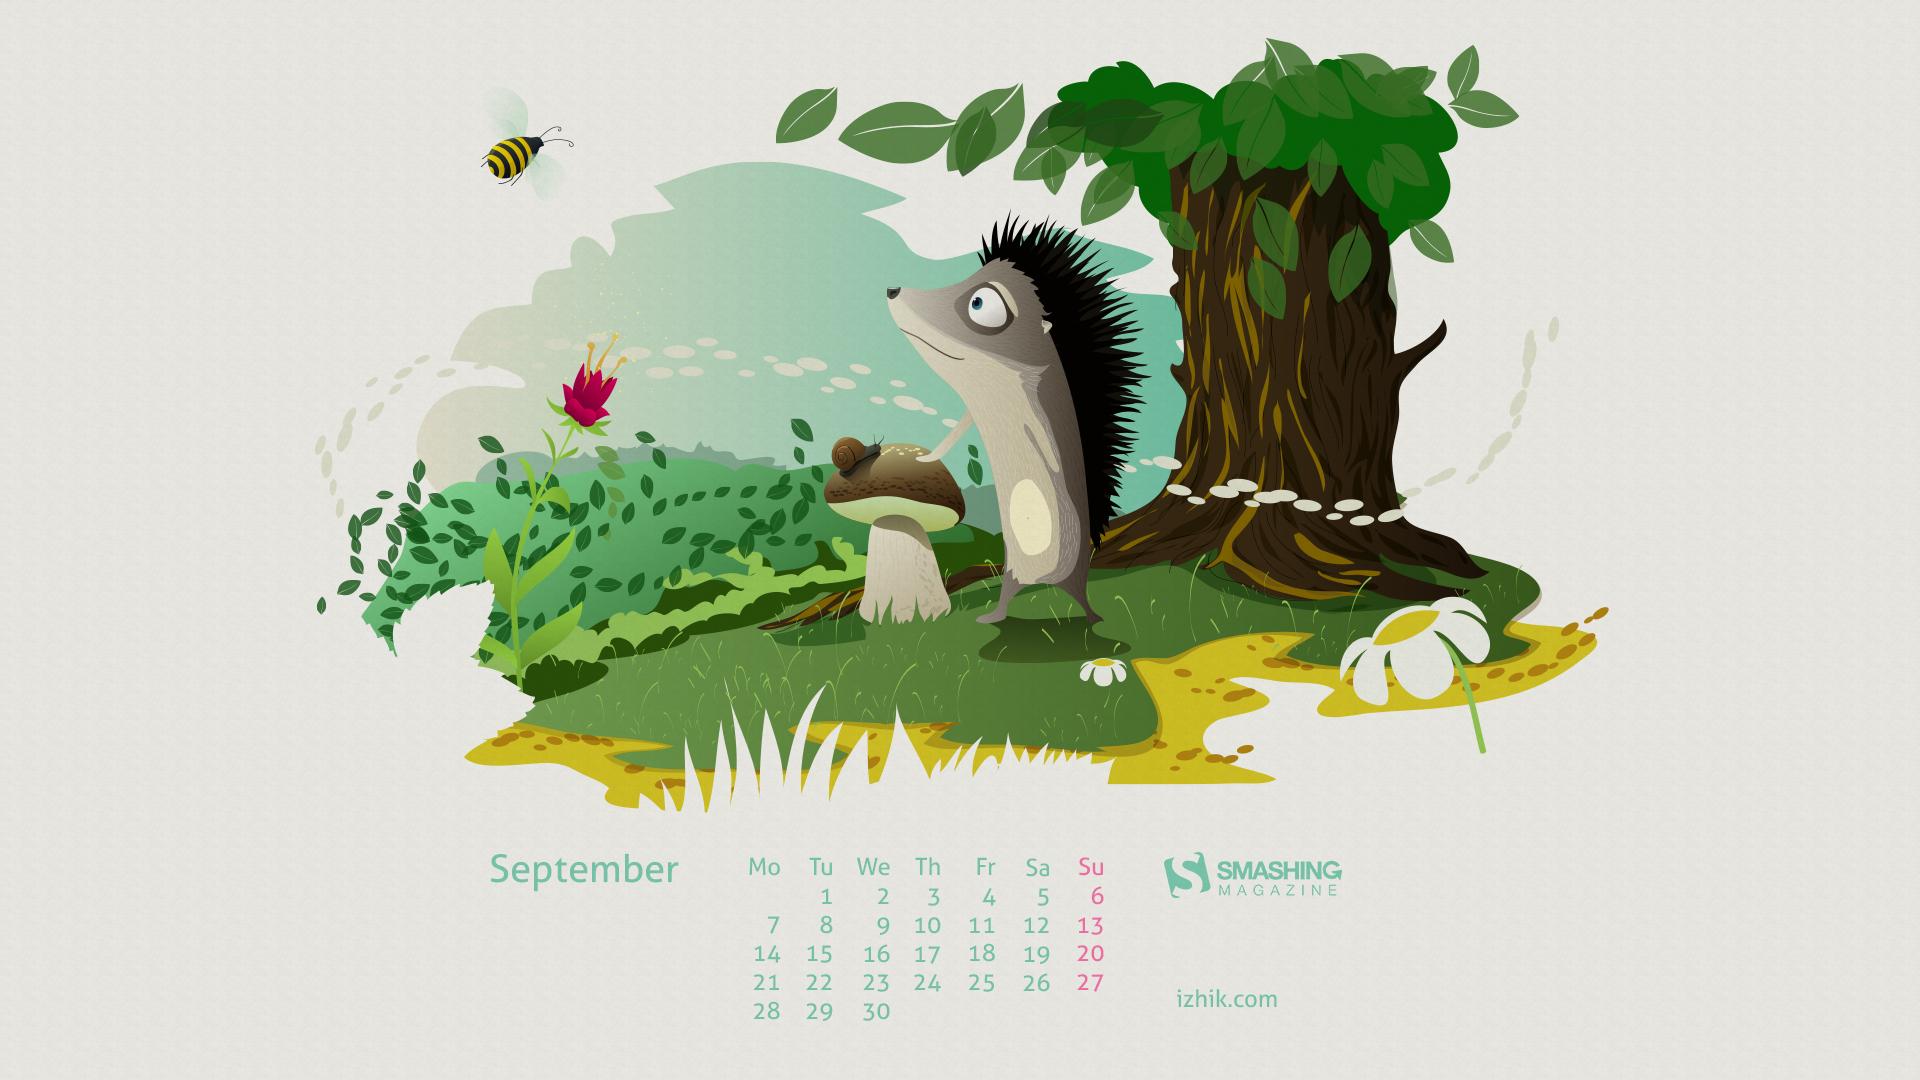 Calendars Wallpapers September 2015 listen closer the mushrooms are 1920x1080